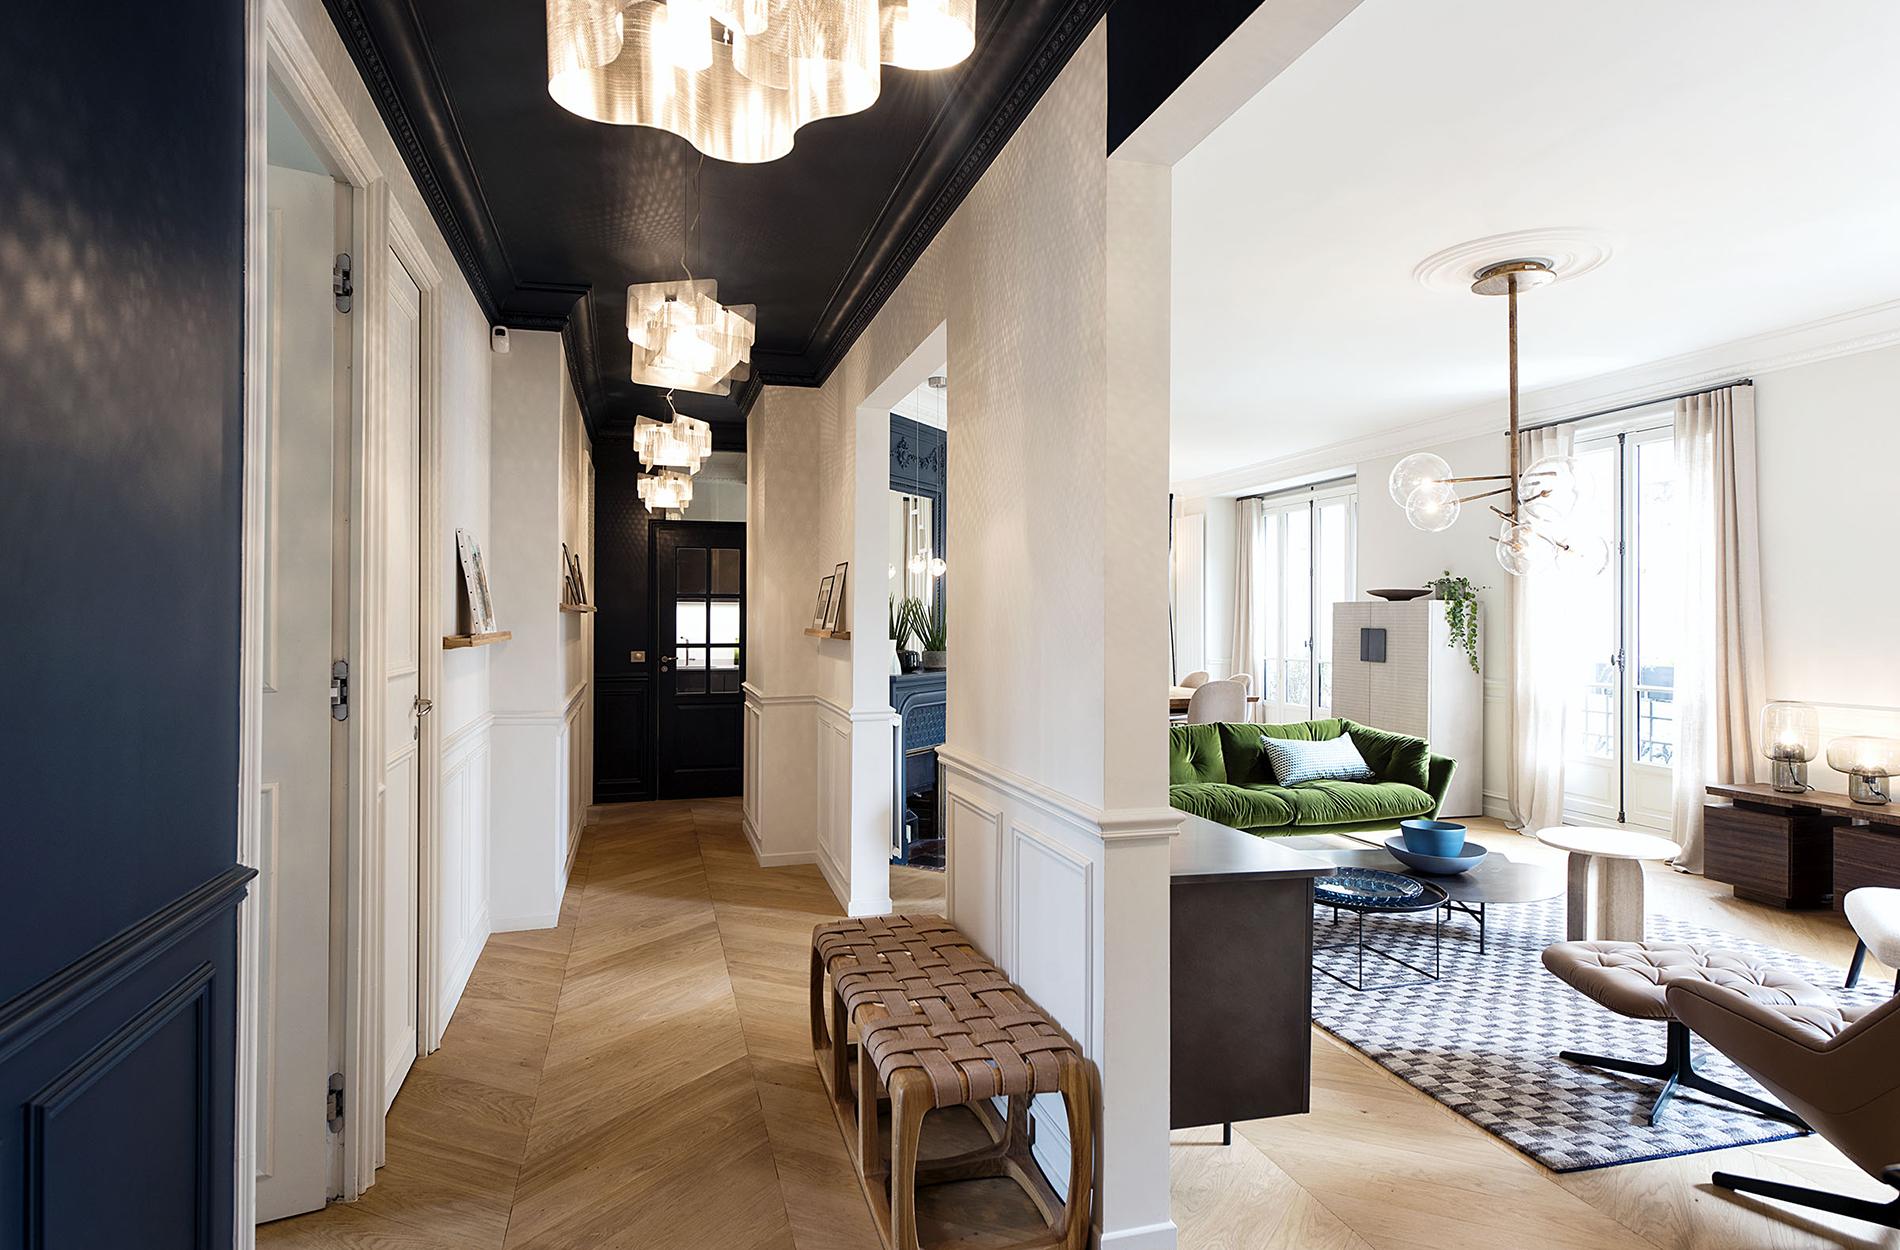 appartement vincennes 10surdix. Black Bedroom Furniture Sets. Home Design Ideas